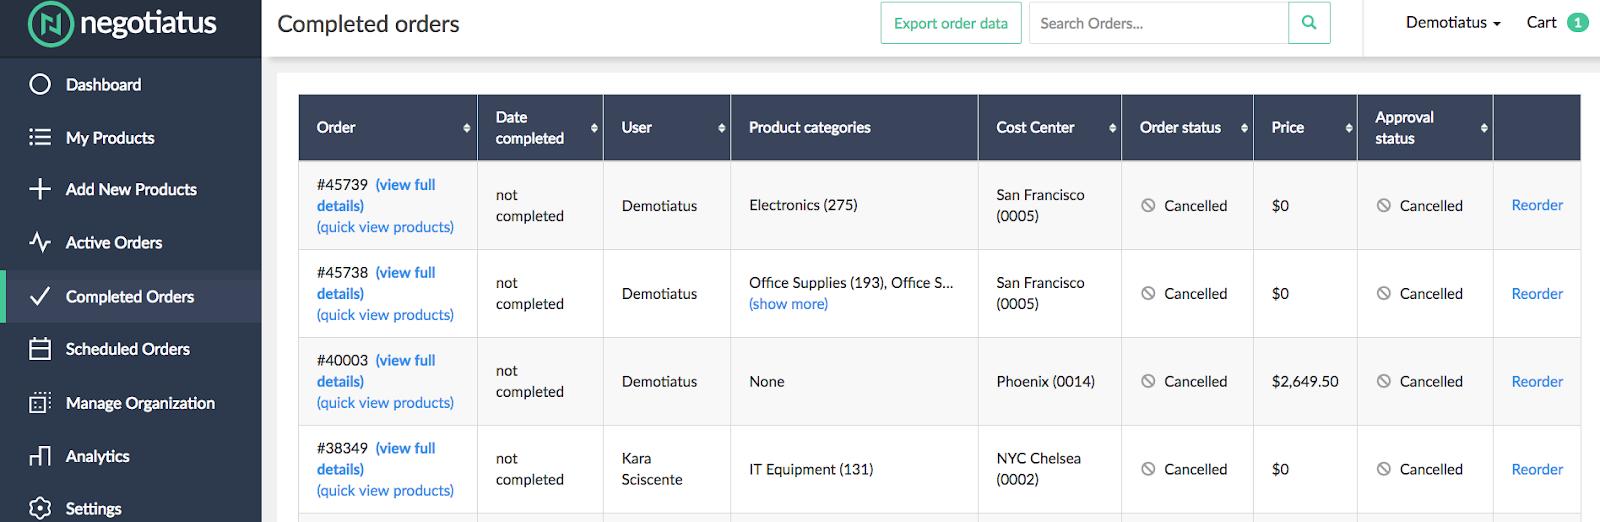 Negotiatus Software - Negotiatus completed orders list